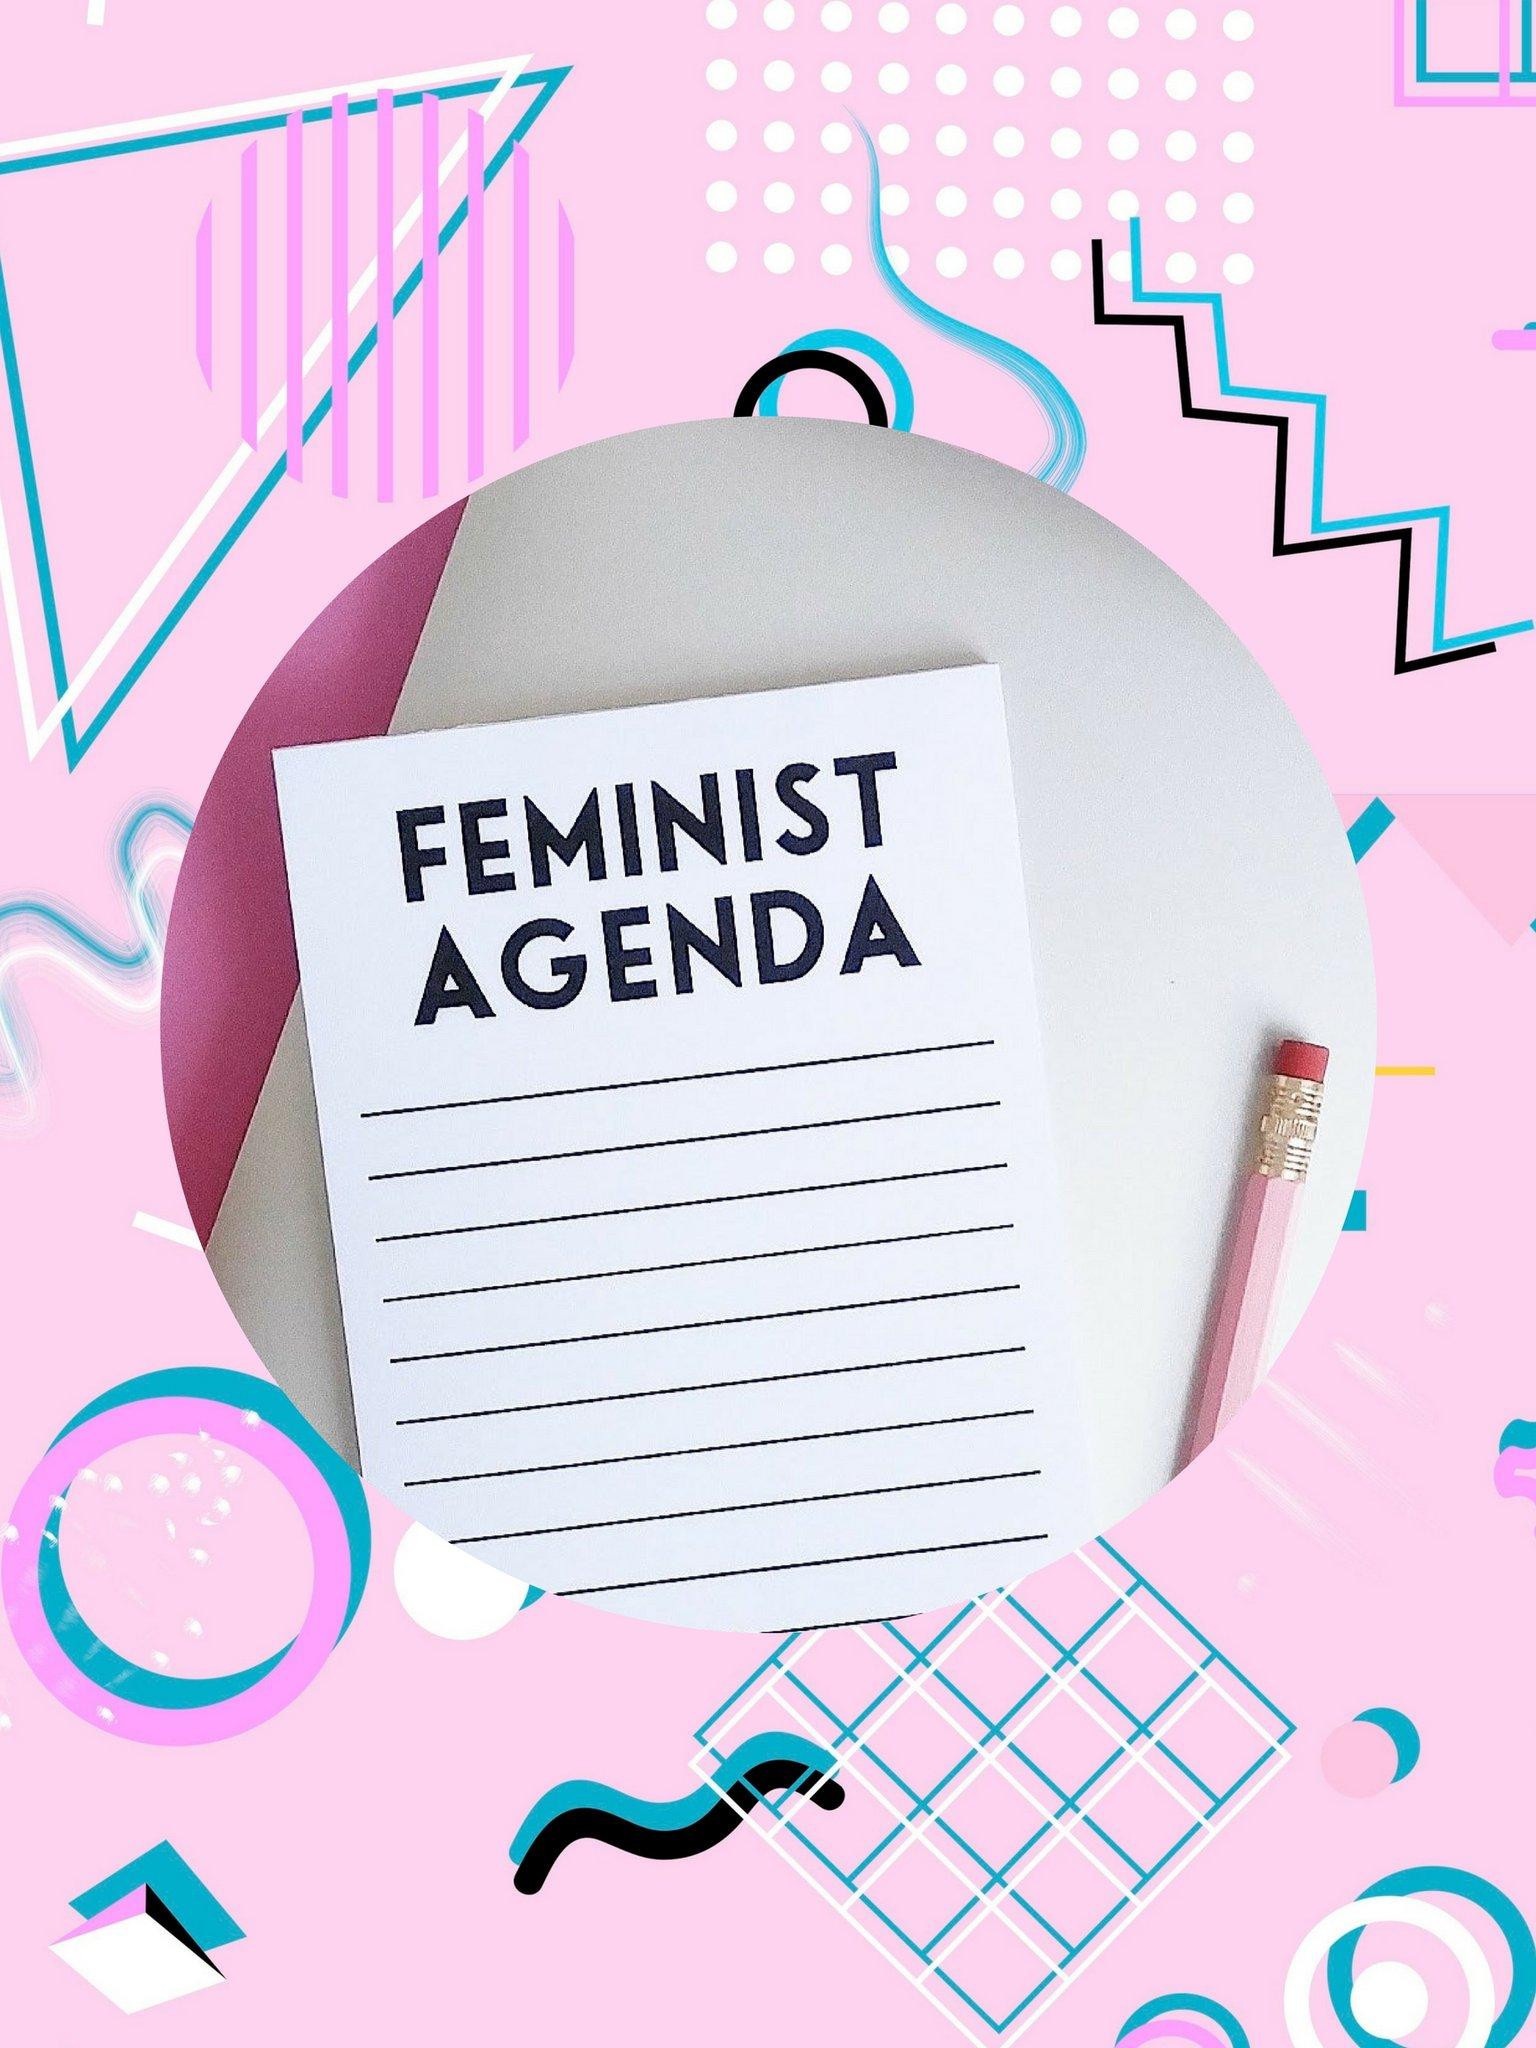 Feminist-Agenda-Notepad_1024x1024@2x.jpg